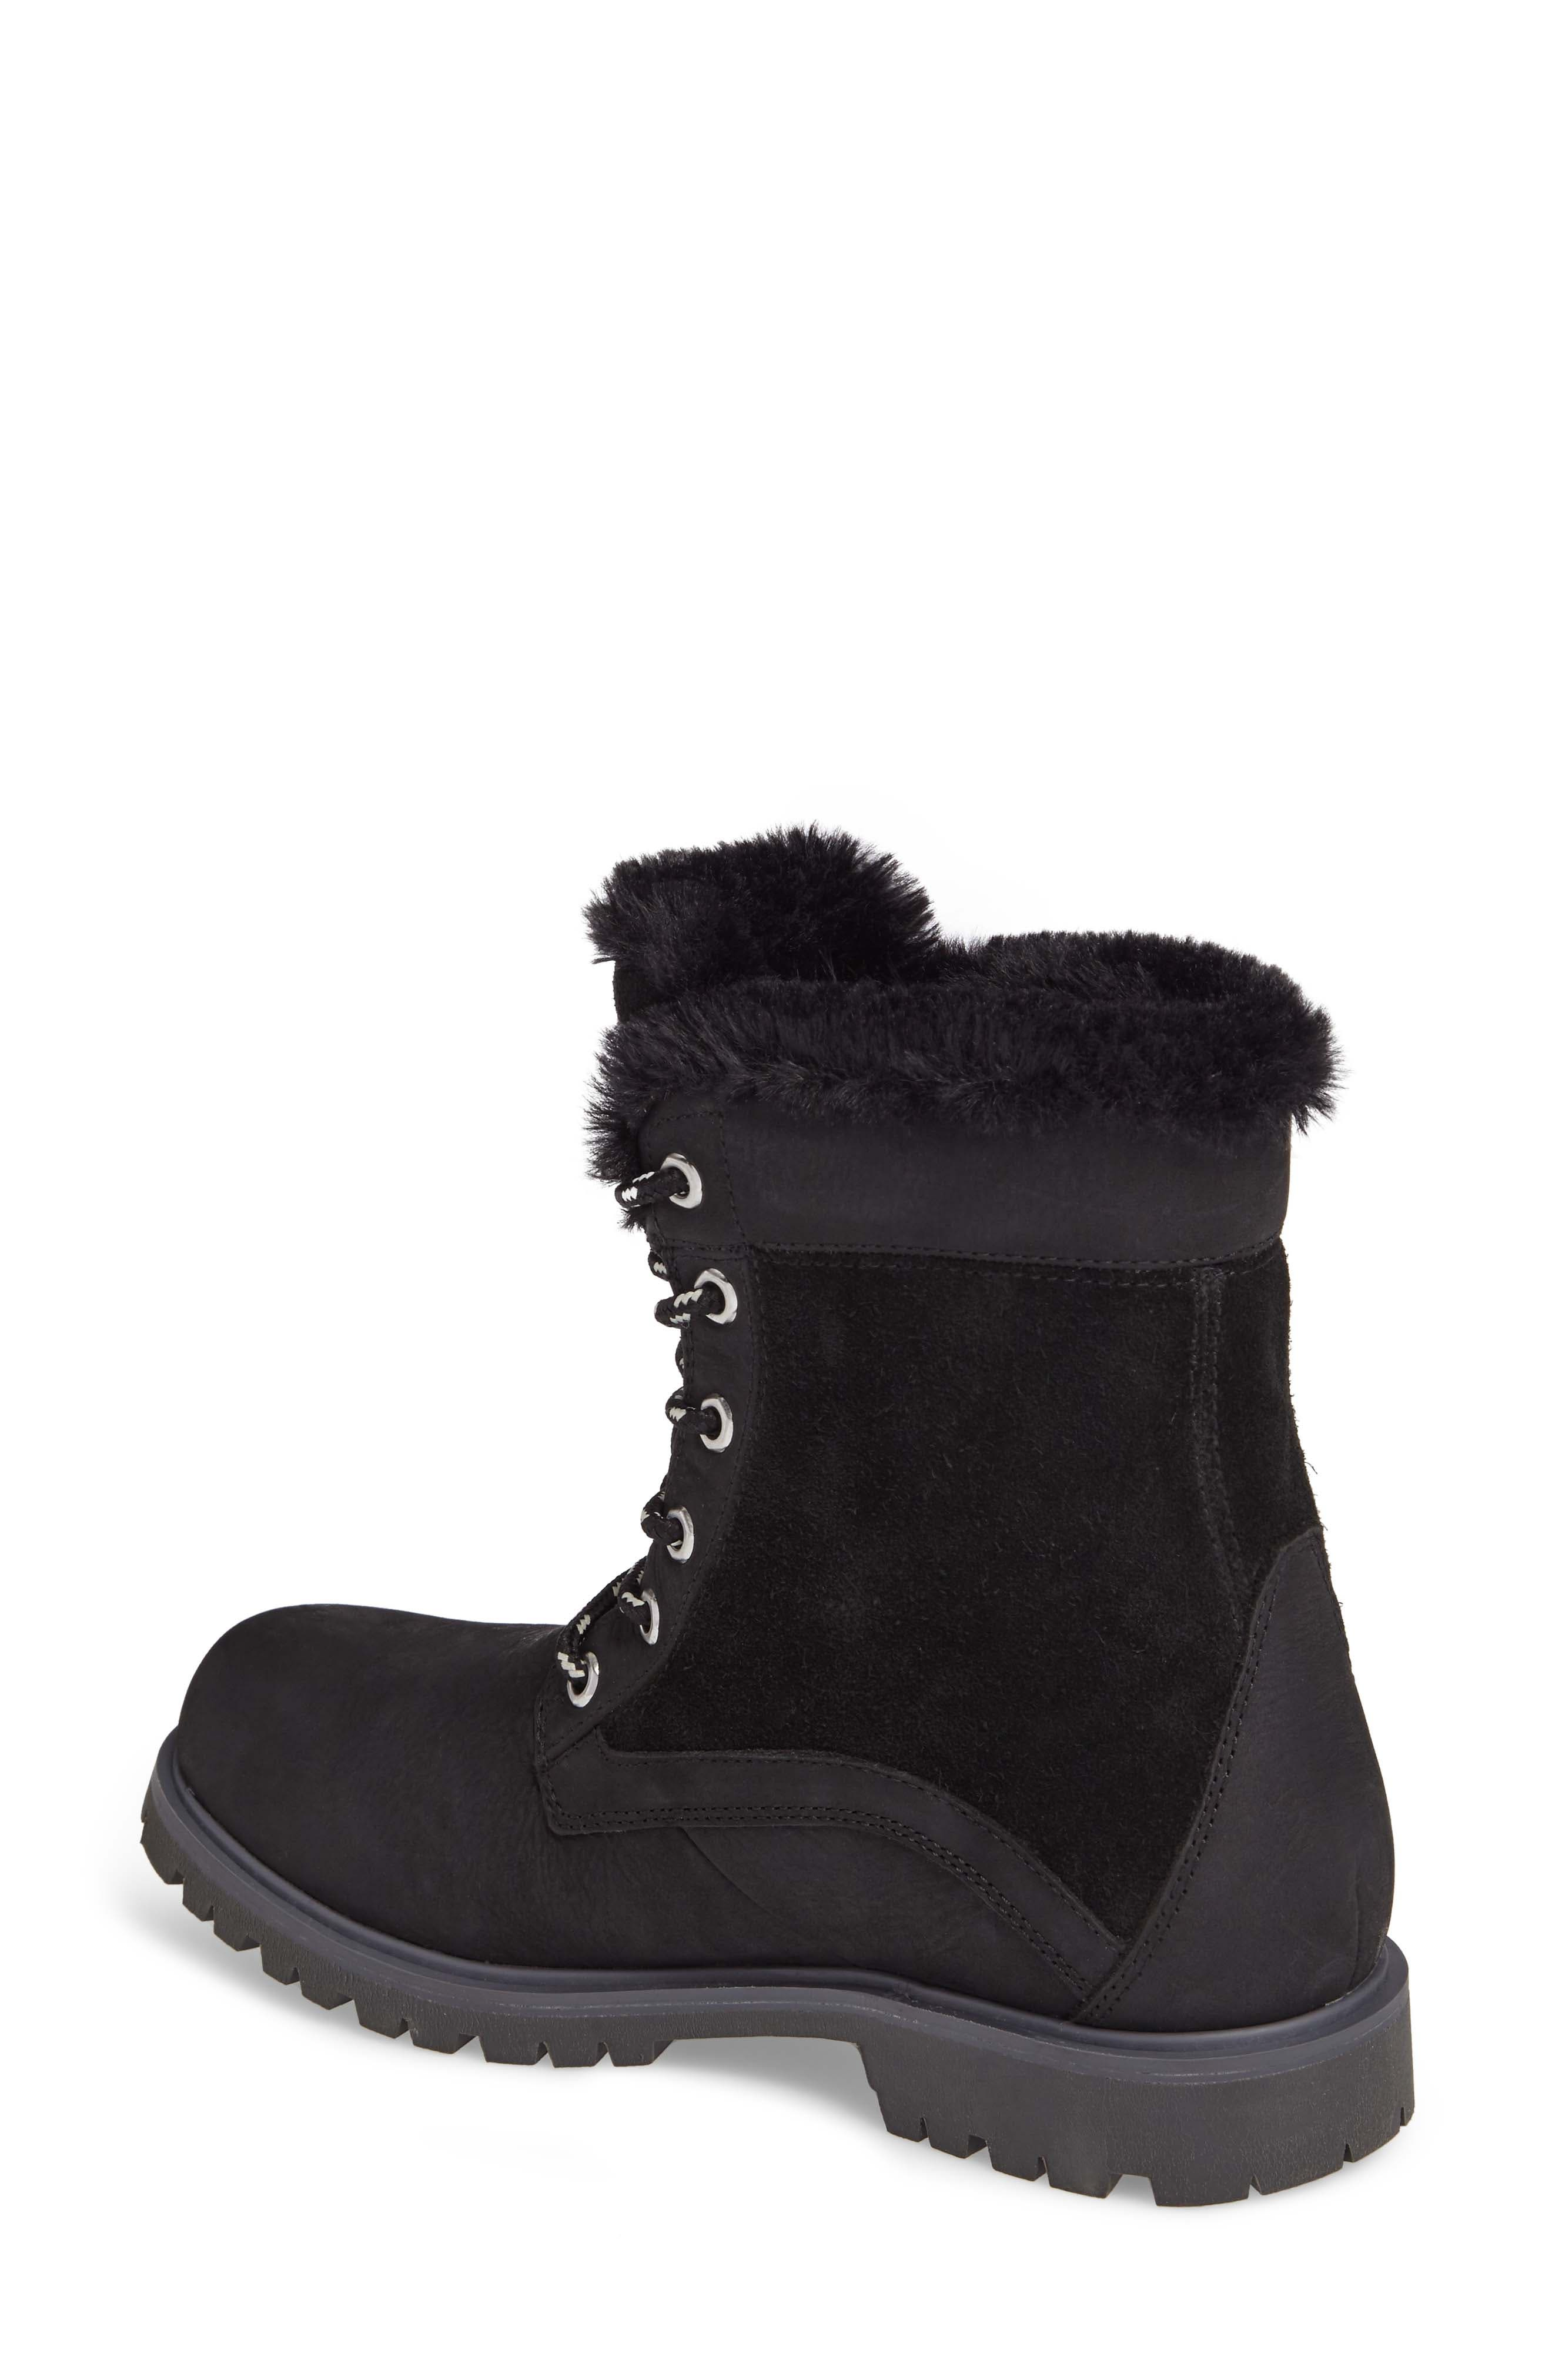 Marion Waterproof Winter Boot,                             Alternate thumbnail 2, color,                             Jet Black / Ebony / Black